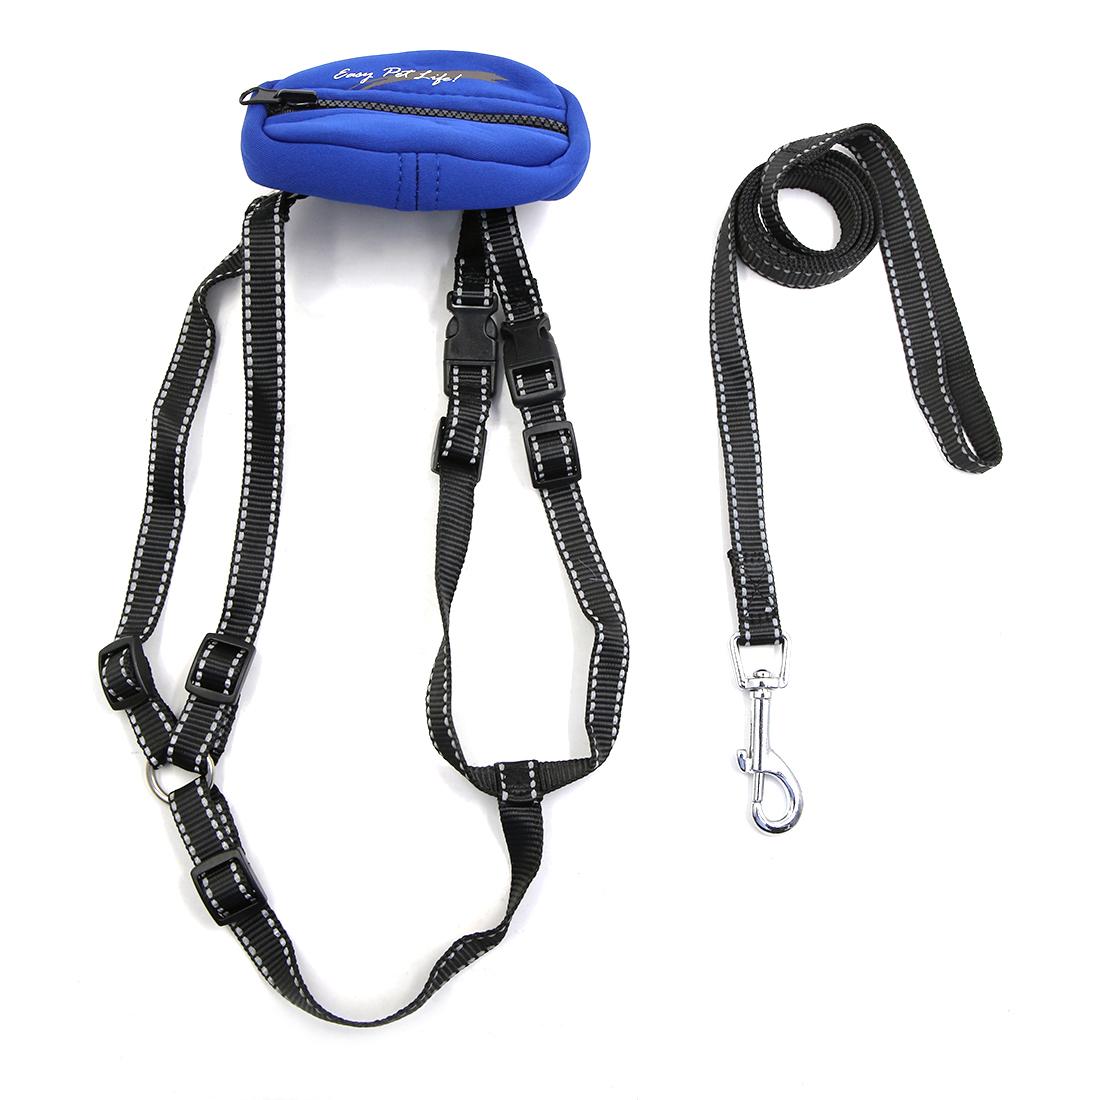 Safe Reflective Dog Harness Leash Adjustable Nylon Collar For Walking with Storage Bag Blue M